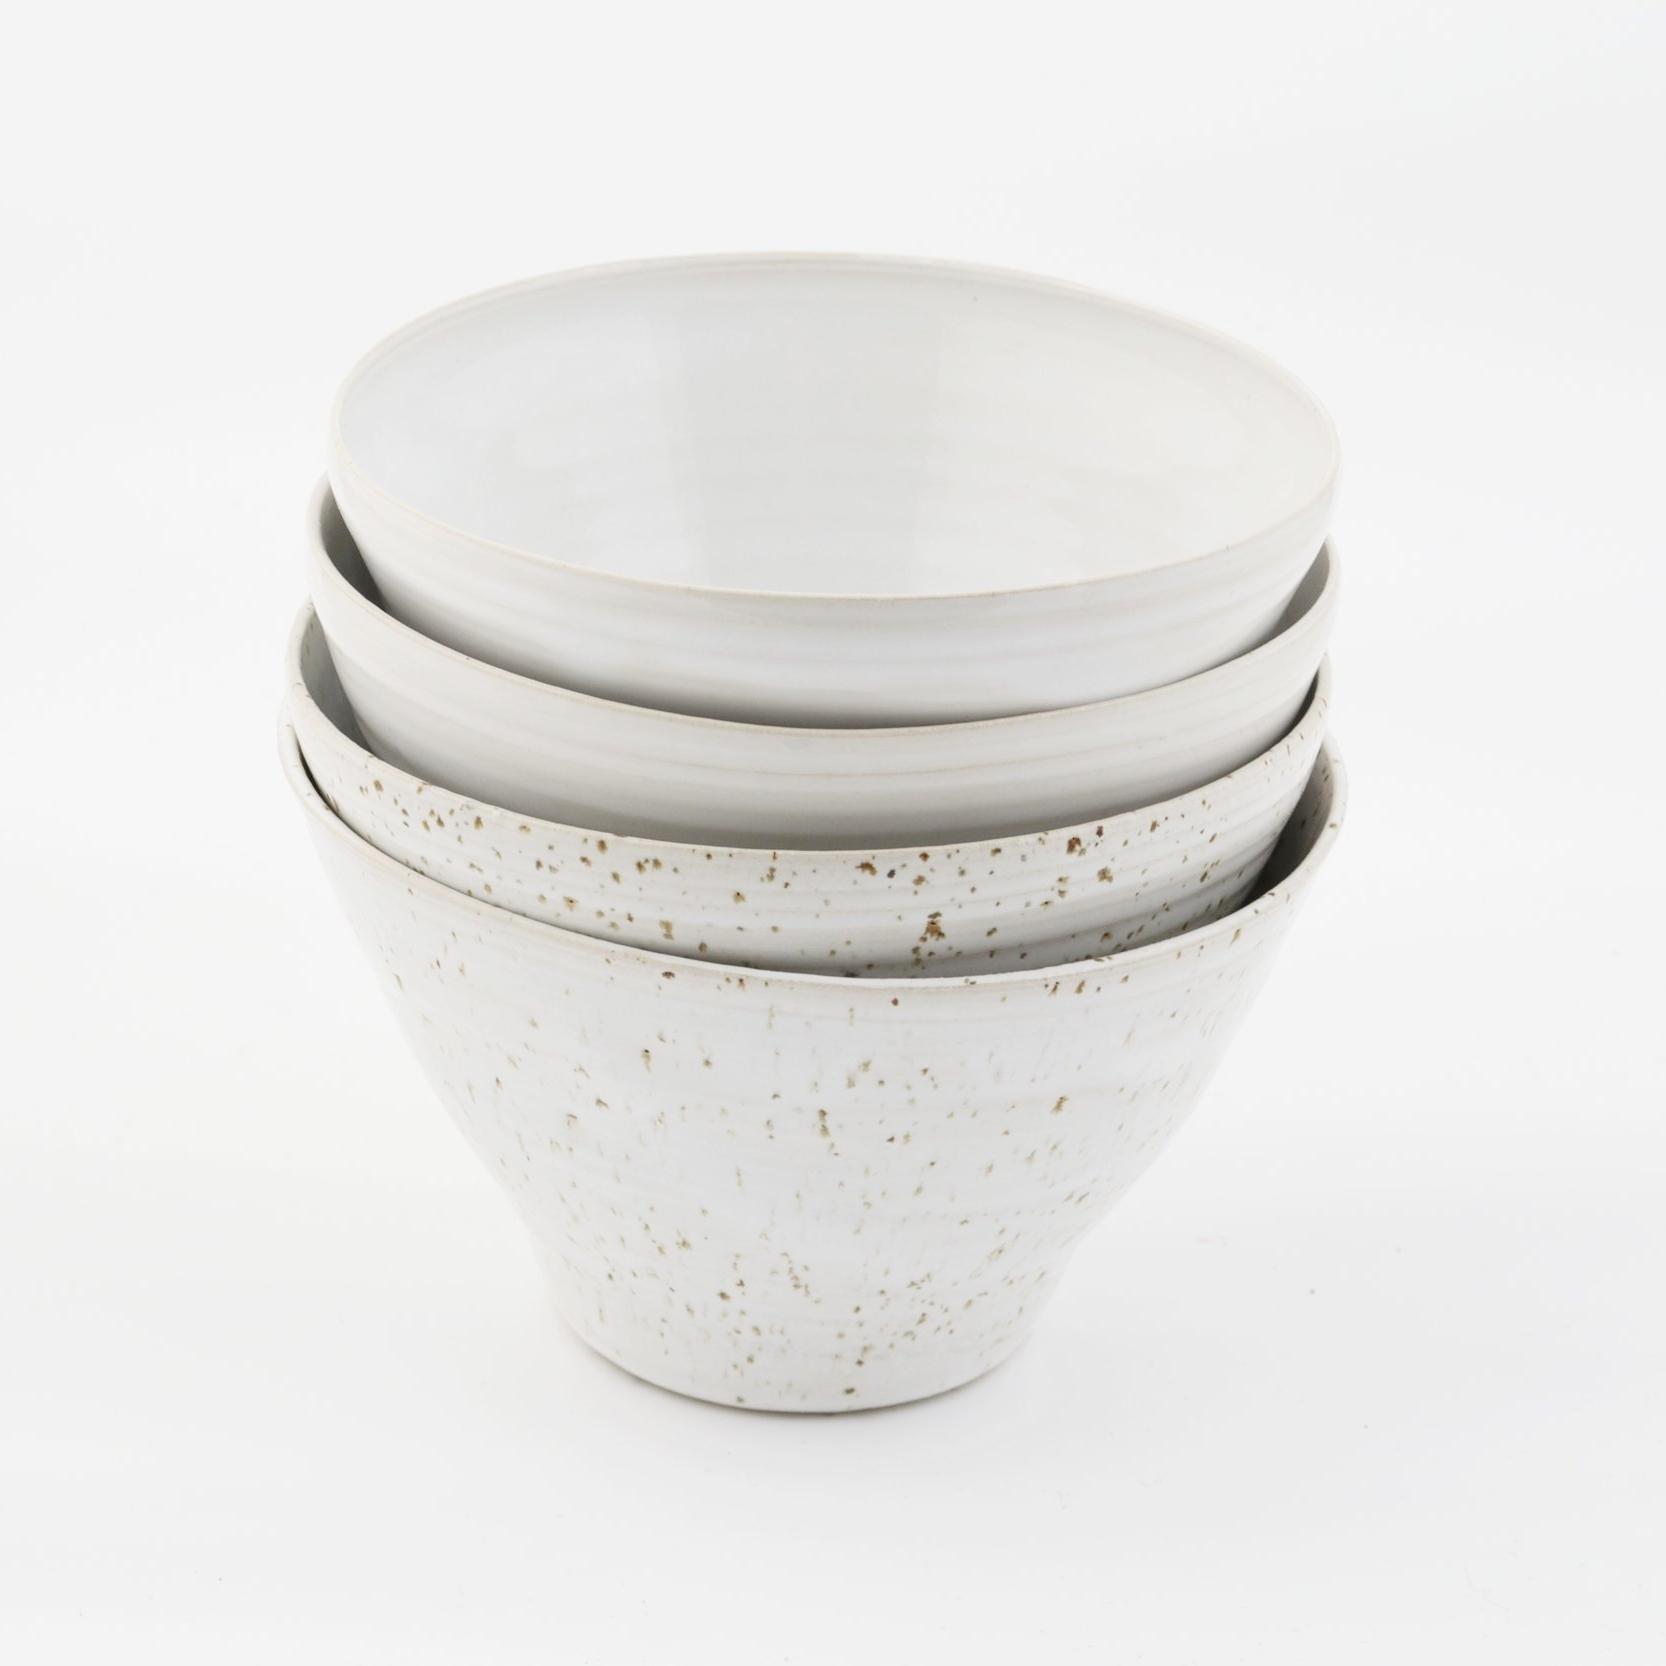 small_bowls_heidi_aulikki.jpg